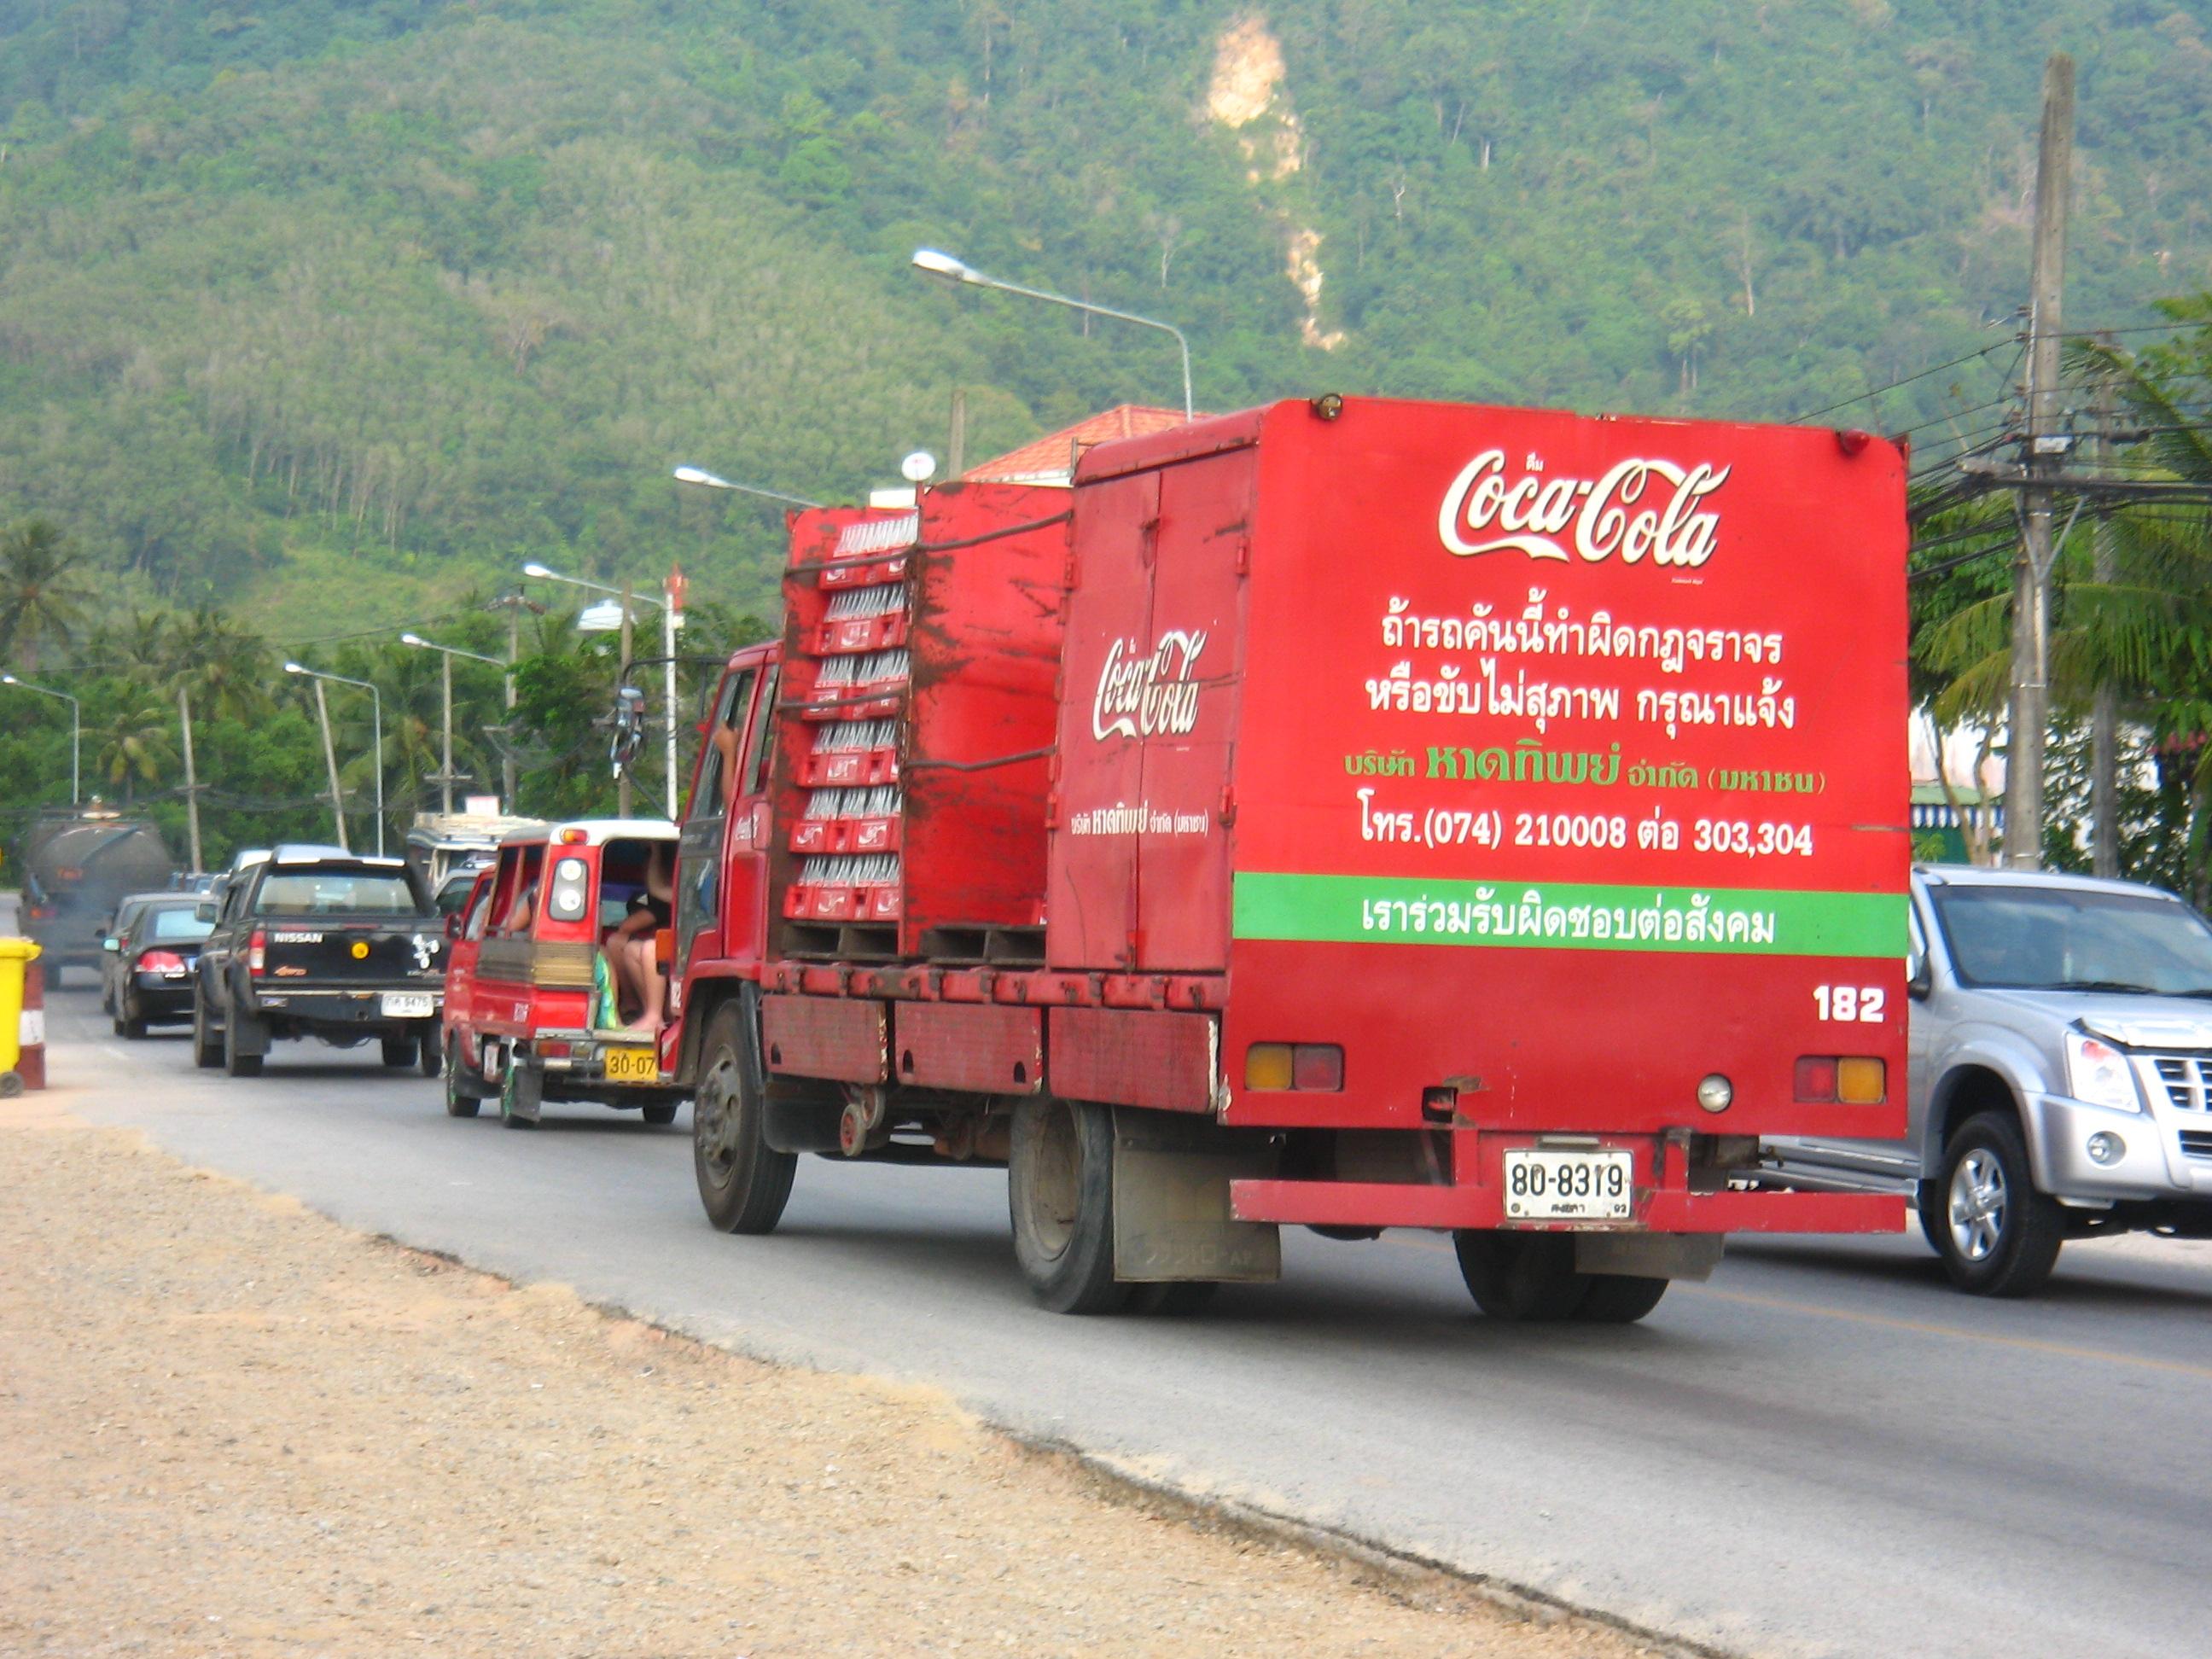 The International Language of Coca Cola